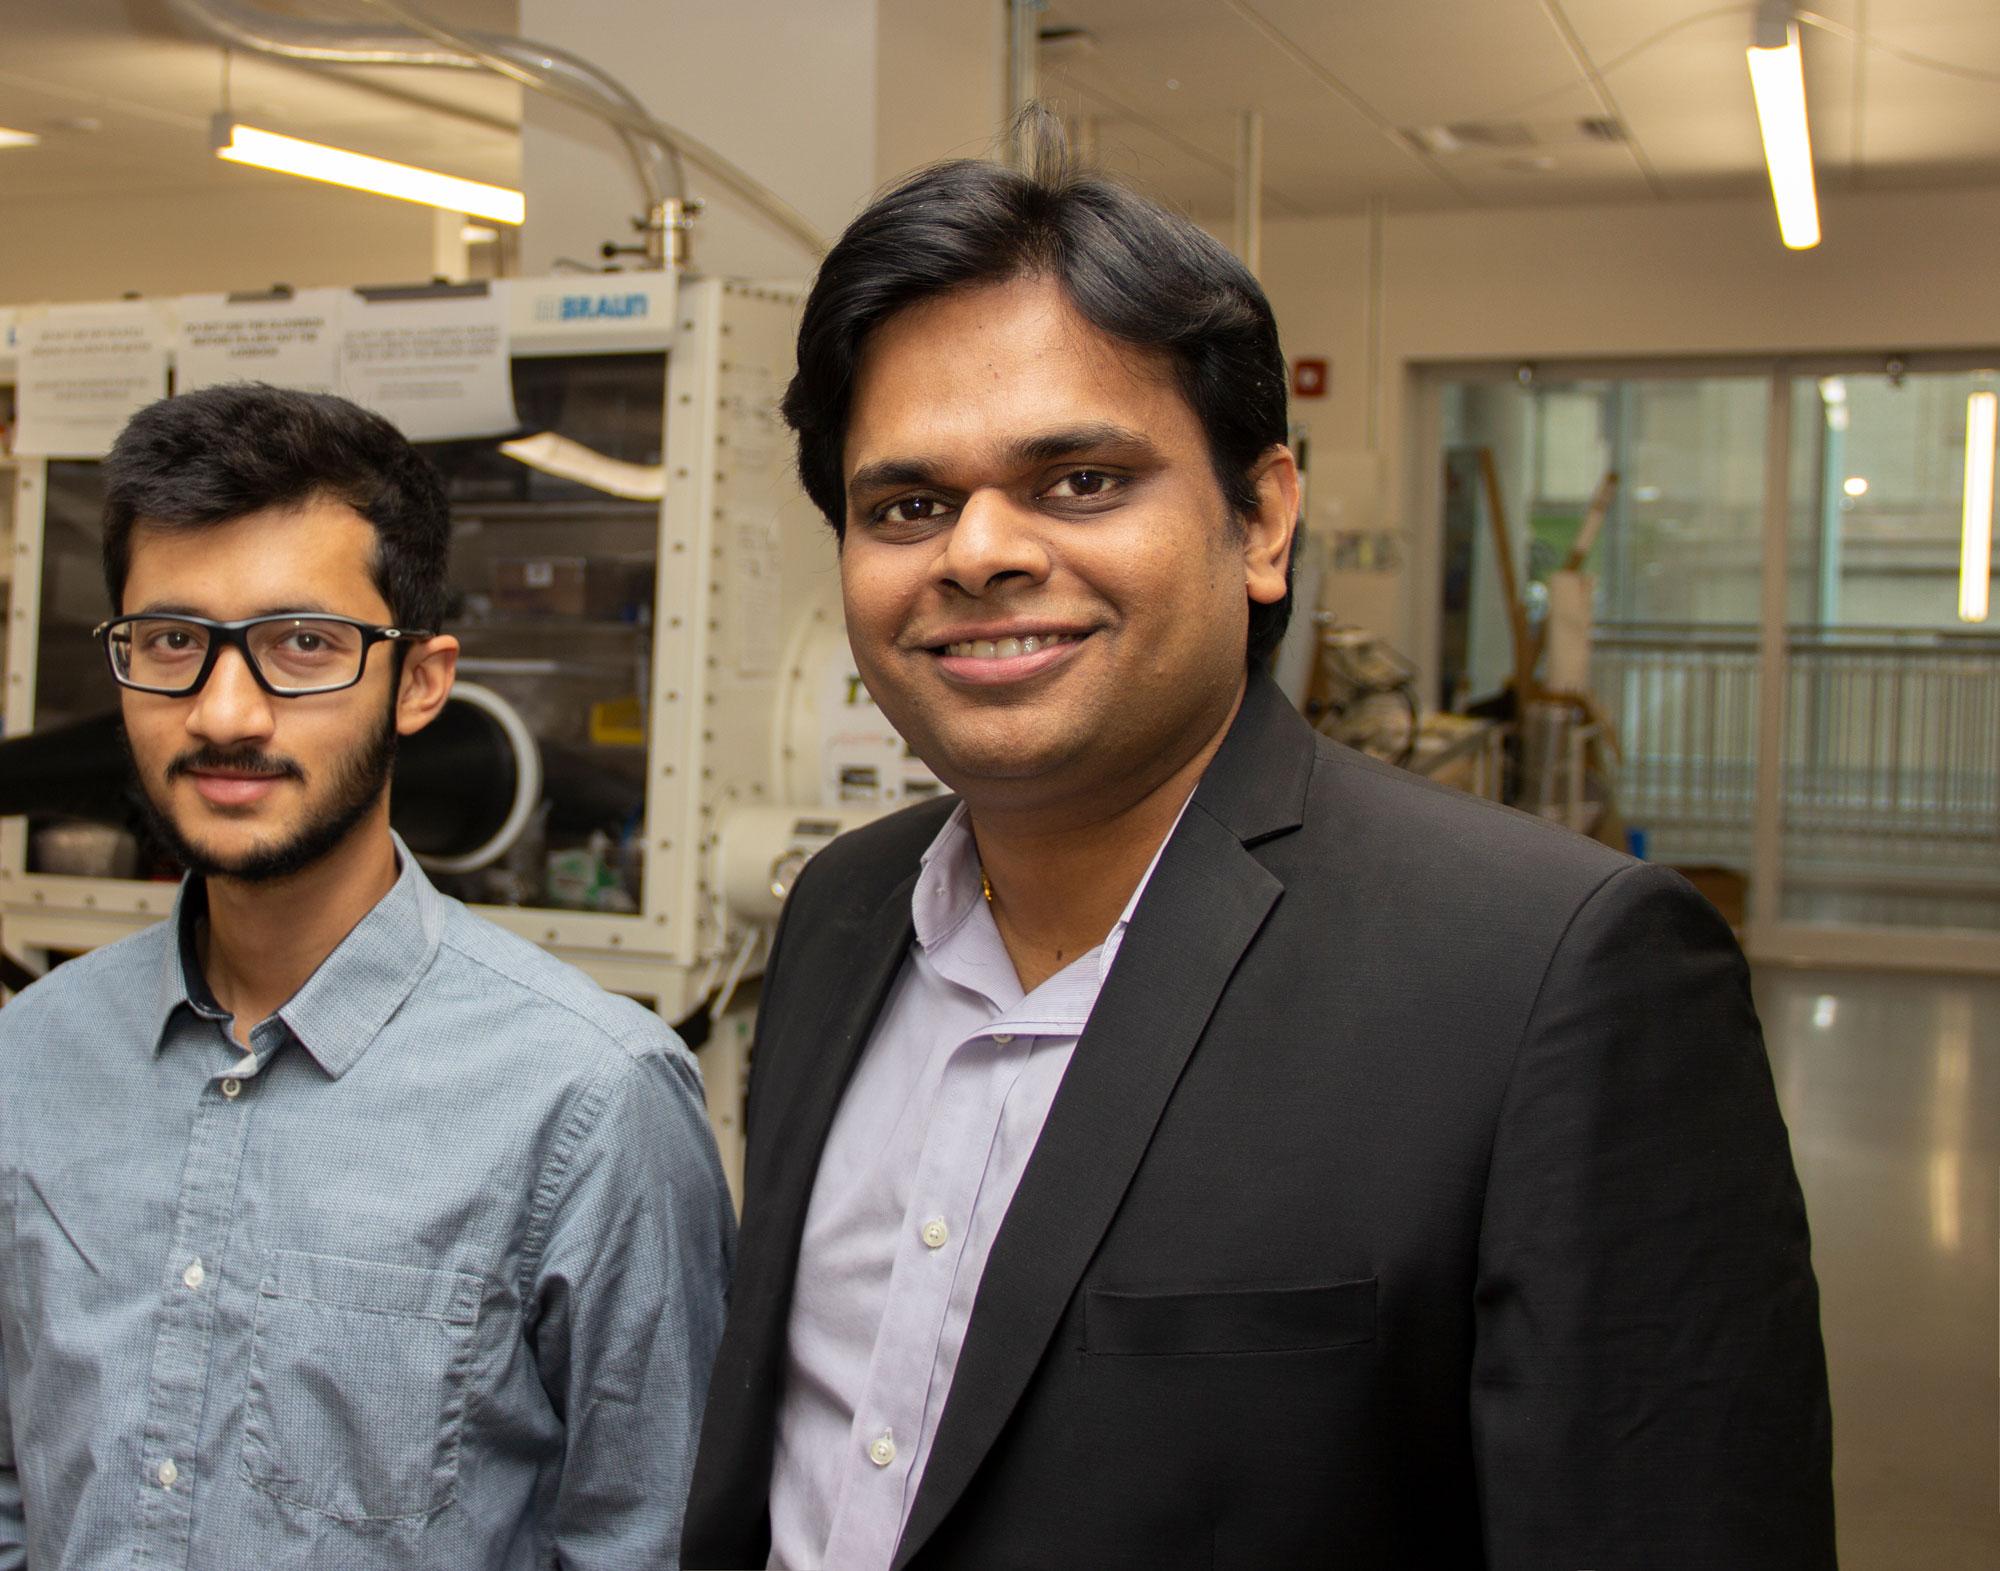 Venkat Viswanathan, profesor asistente de ingeniería mecánica en Carnegie Mellon.